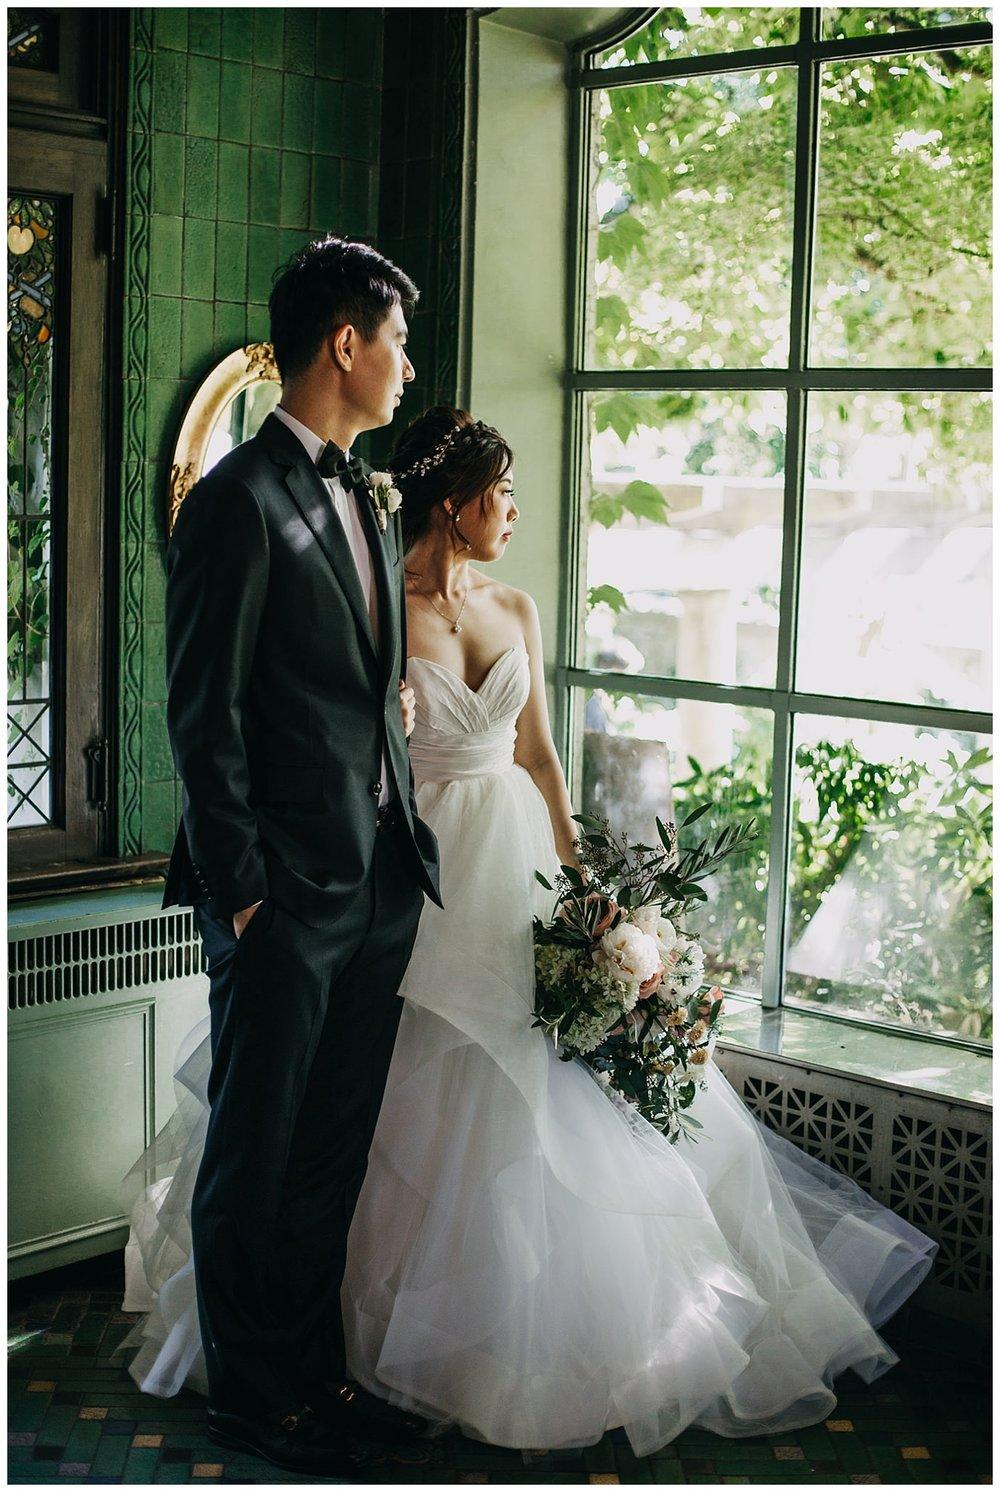 bride and groom moody portrait at hycroft manor wedding